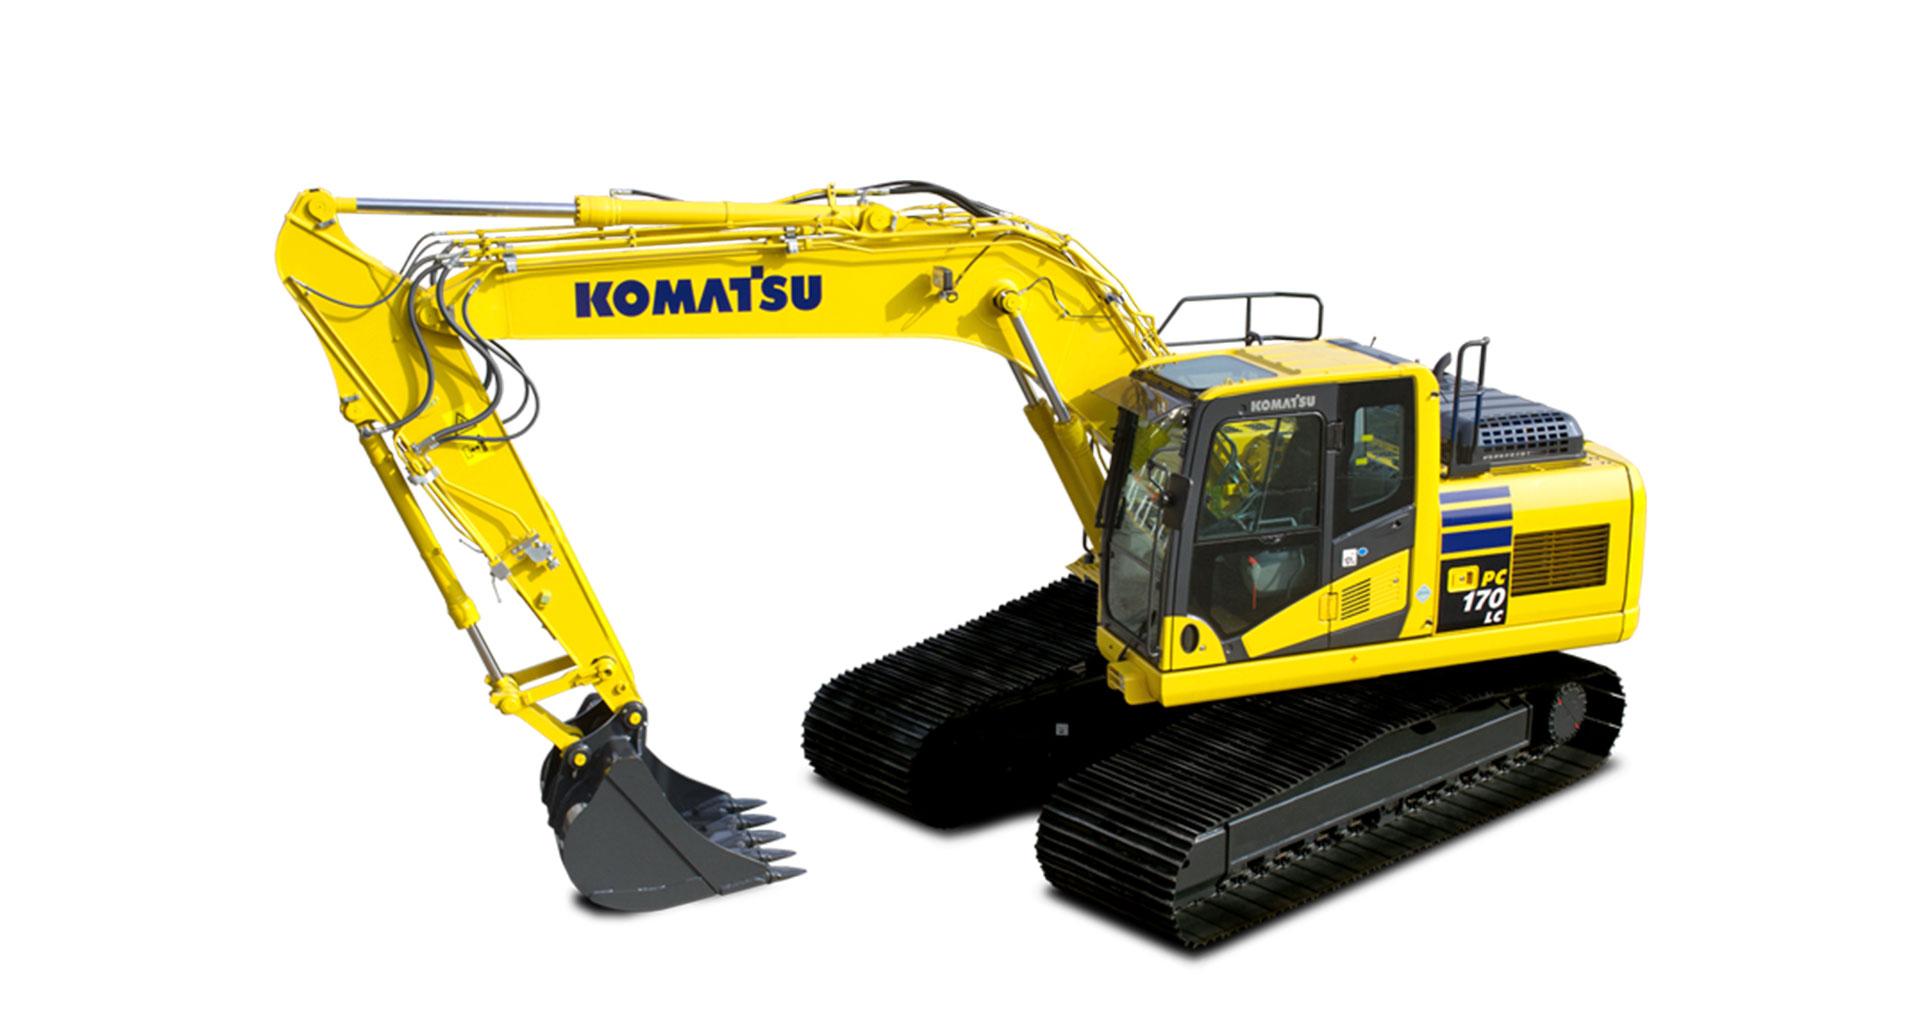 Escavatore cingolato Komatsu PC170LC-11 LGP